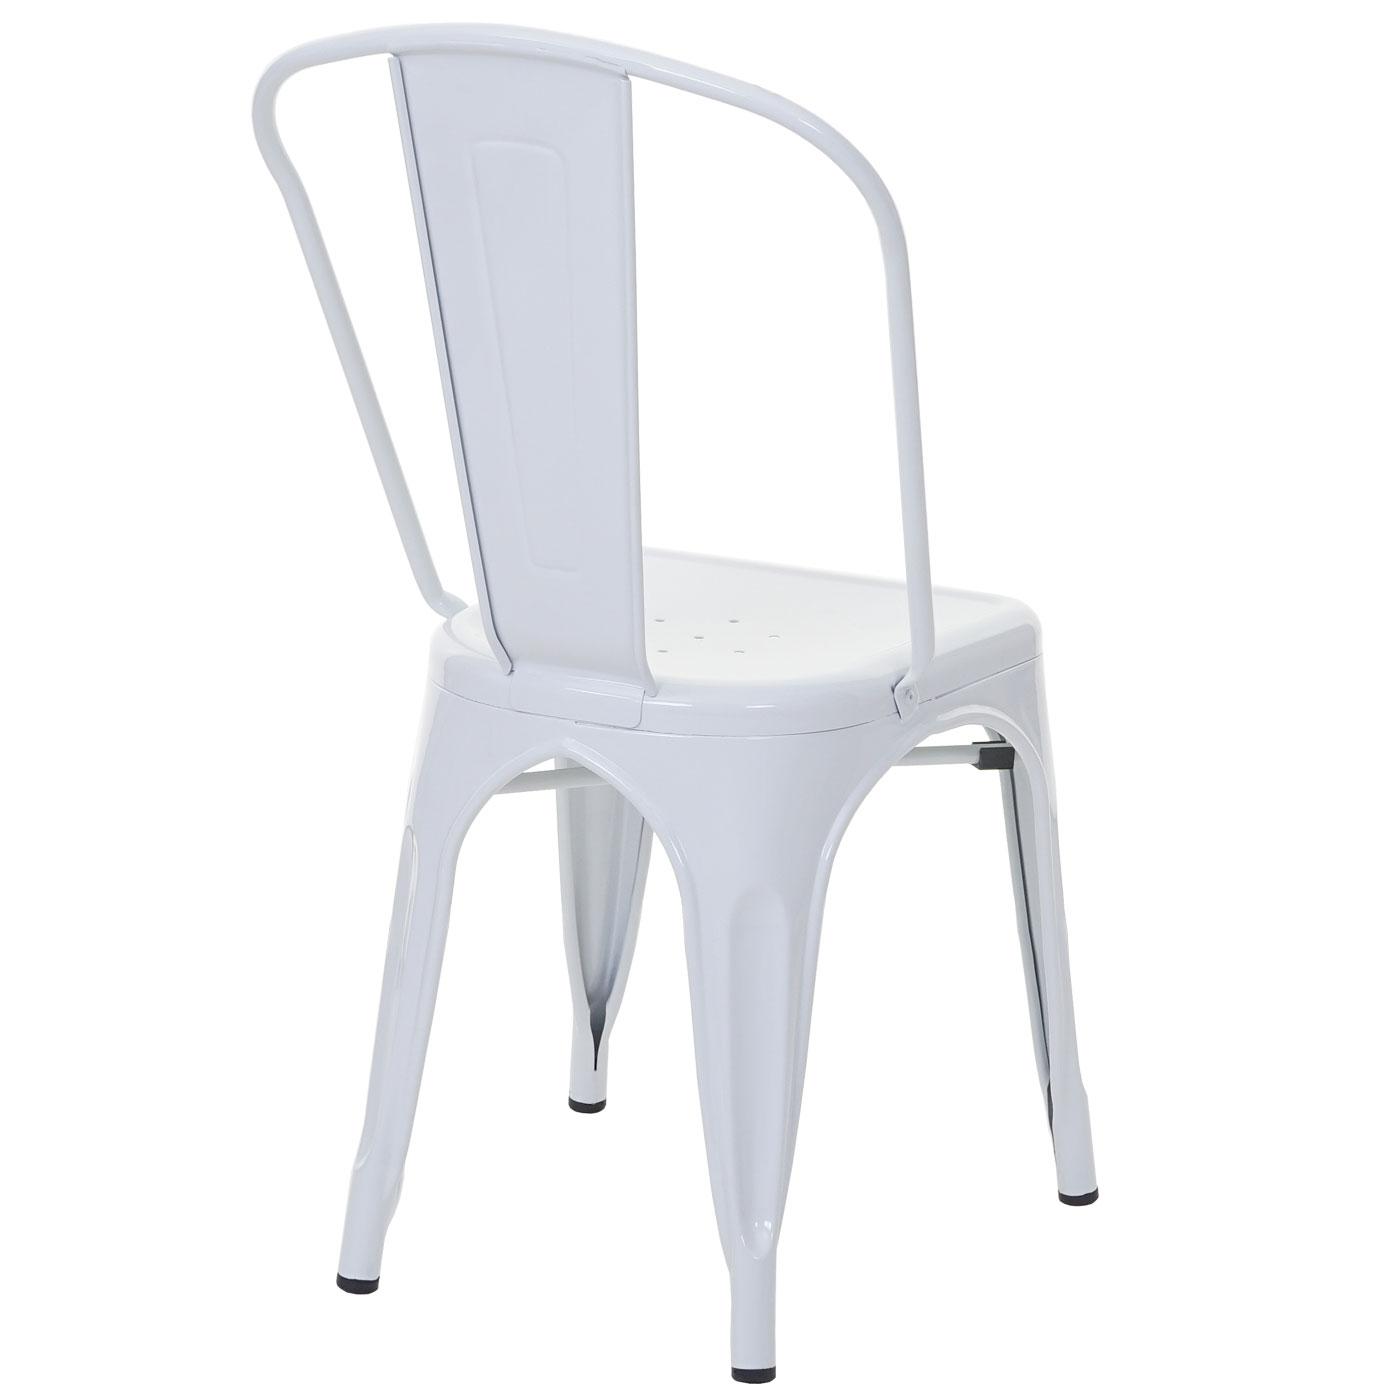 Stapelstuhl hwc a73 bistrostuhl stuhl metall for Stuhl industriedesign